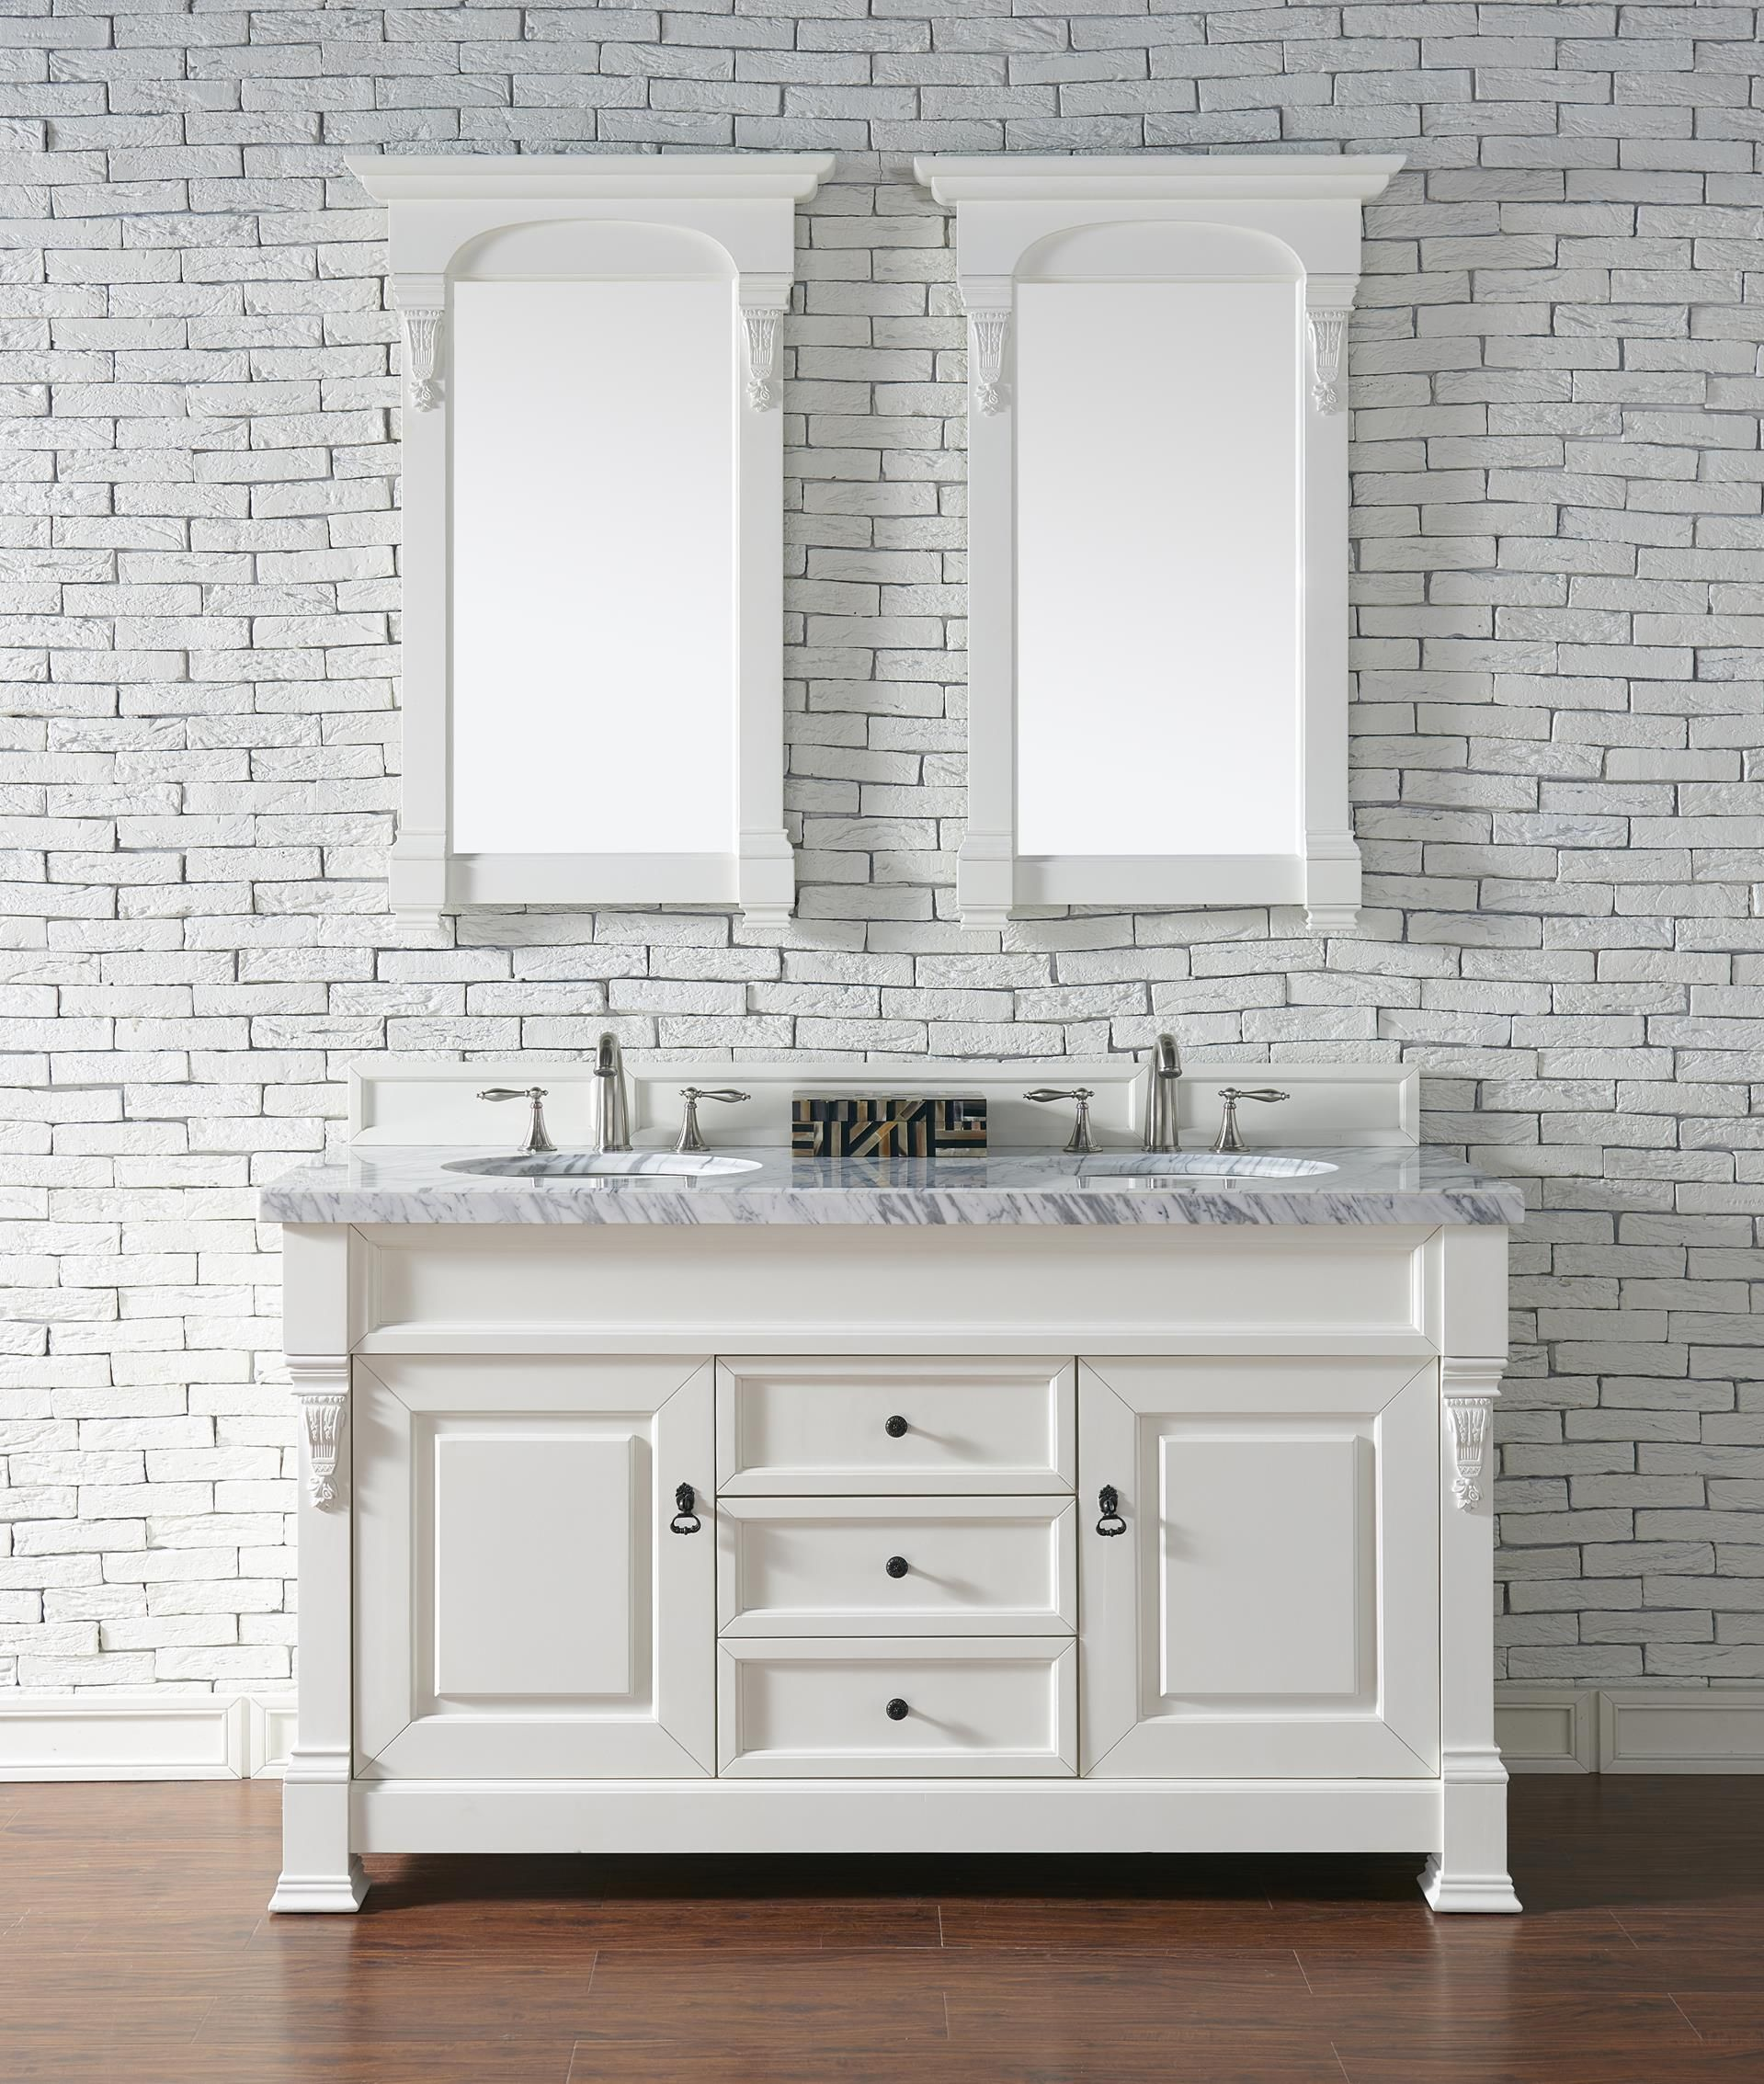 brookfield 60 double sink bathroom vanity cabinet cottage white rh pinterest com Craftsman Style Bathroom Vanity Cabinets Farmhouse Bathroom Vanity Cabinets